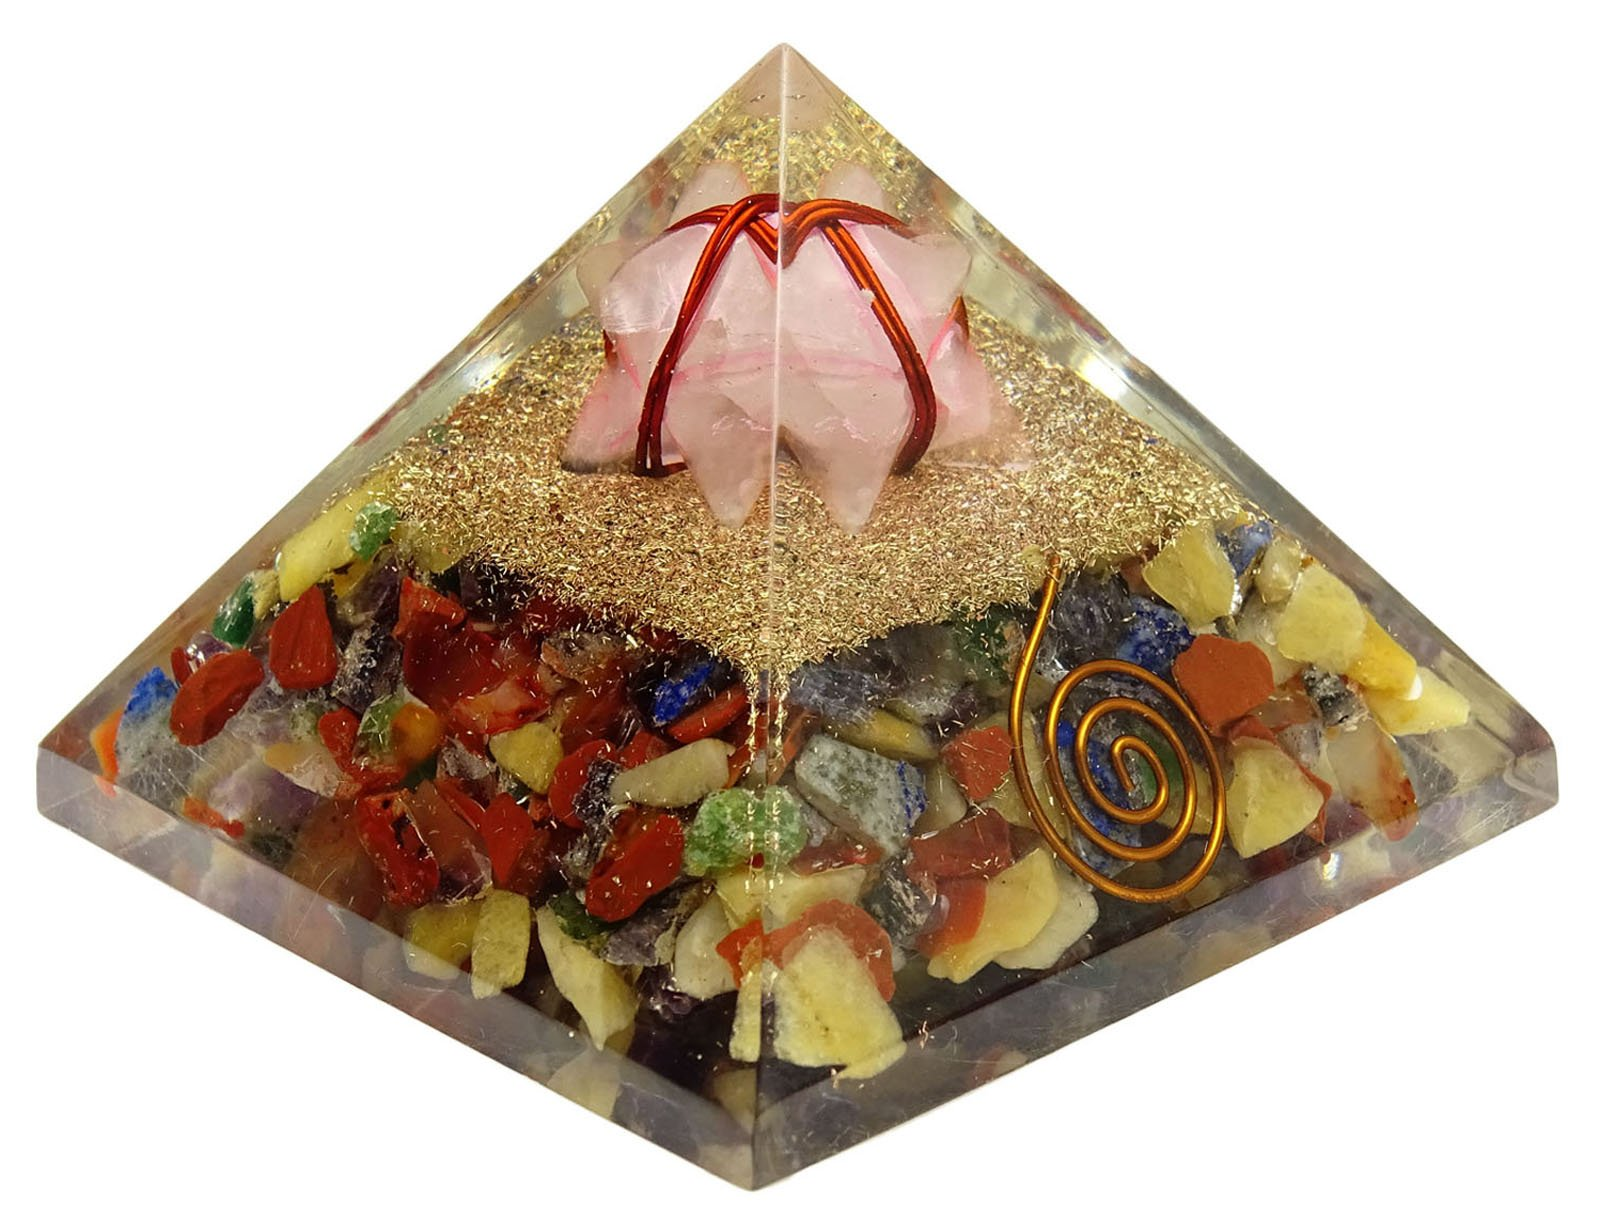 HARMONIZE Multistone Orgone Pyramid With Merkaba Gemstone Reiki Healing Crystal Chakra Energy Generator